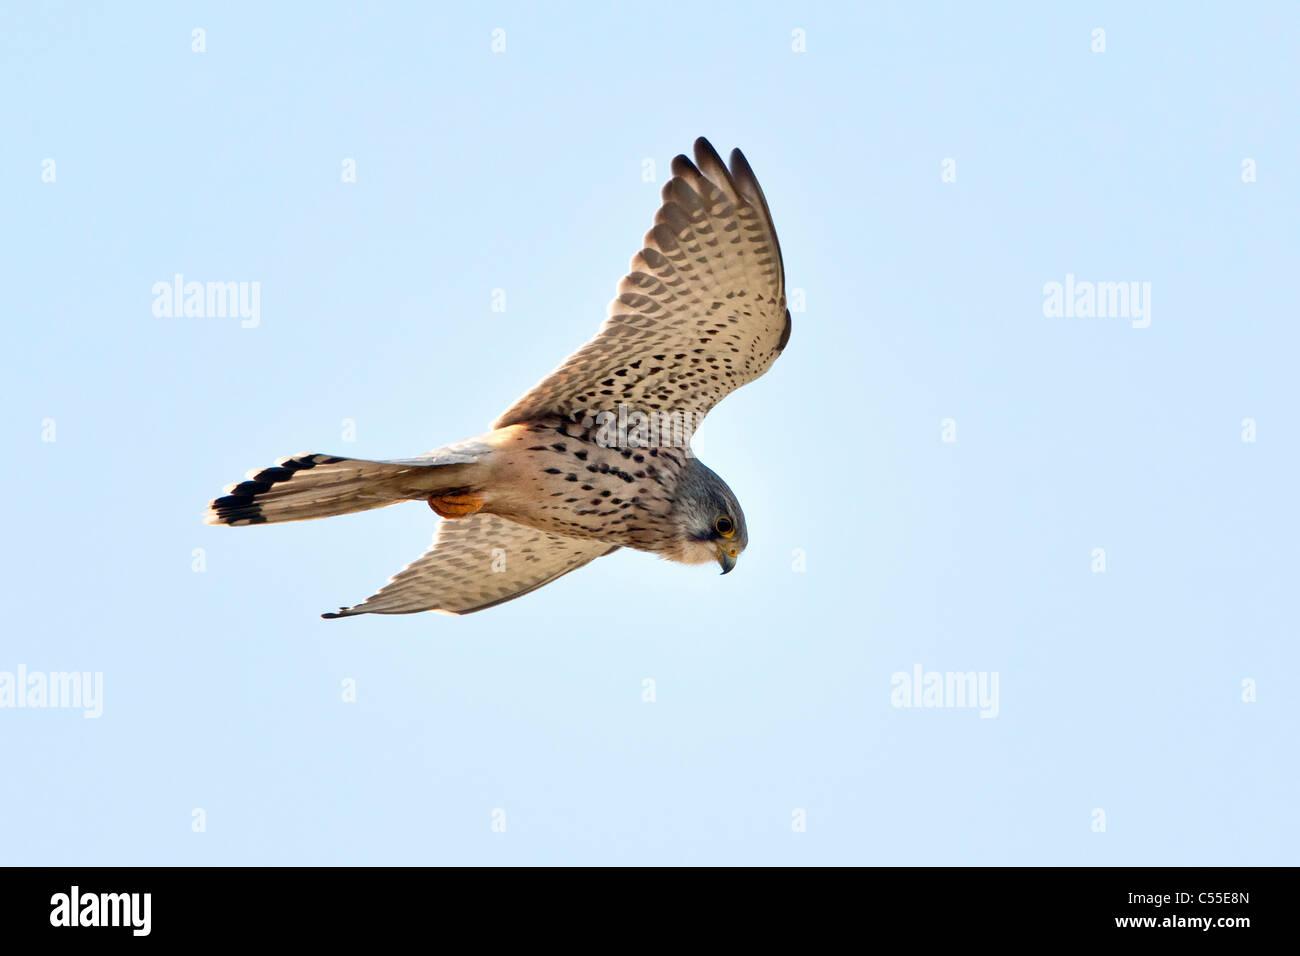 The Netherlands, Nijmegen, Common Kestrel, Falco tinnunculus. Falcon family. - Stock Image